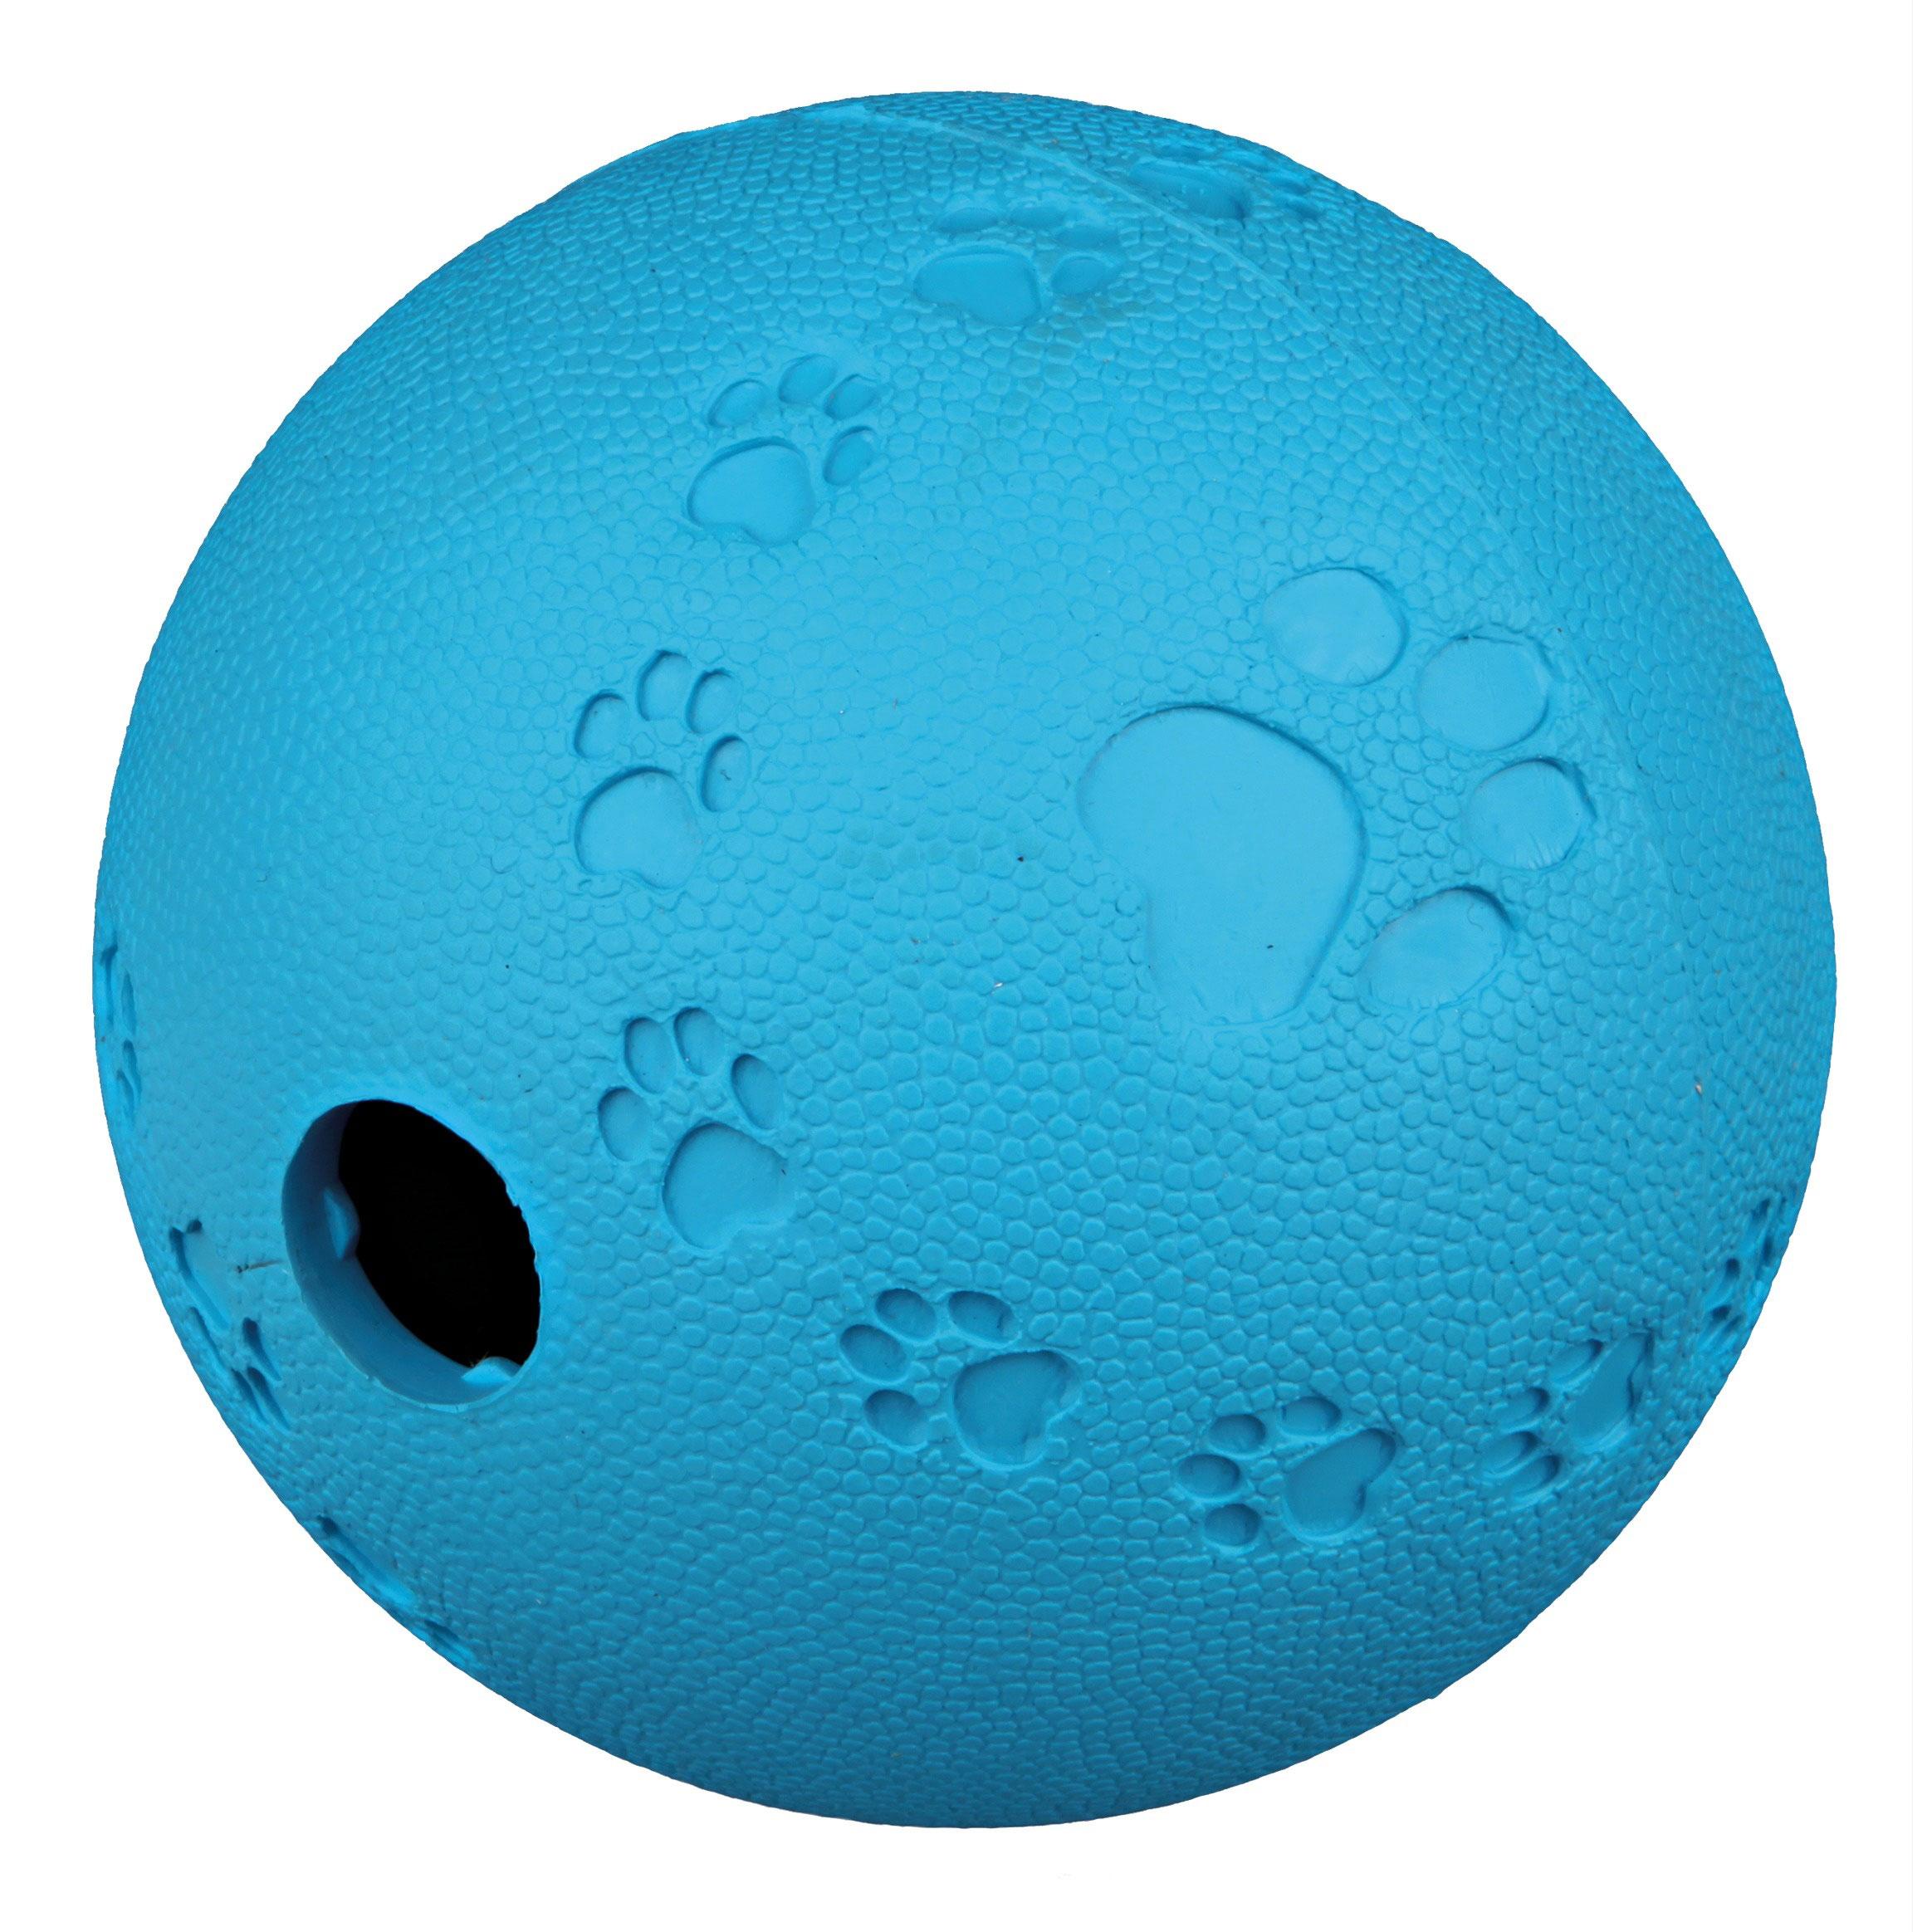 Hundespielzeug TRIXIE Dog Activity Snackball Ø 7 cm Bild 1